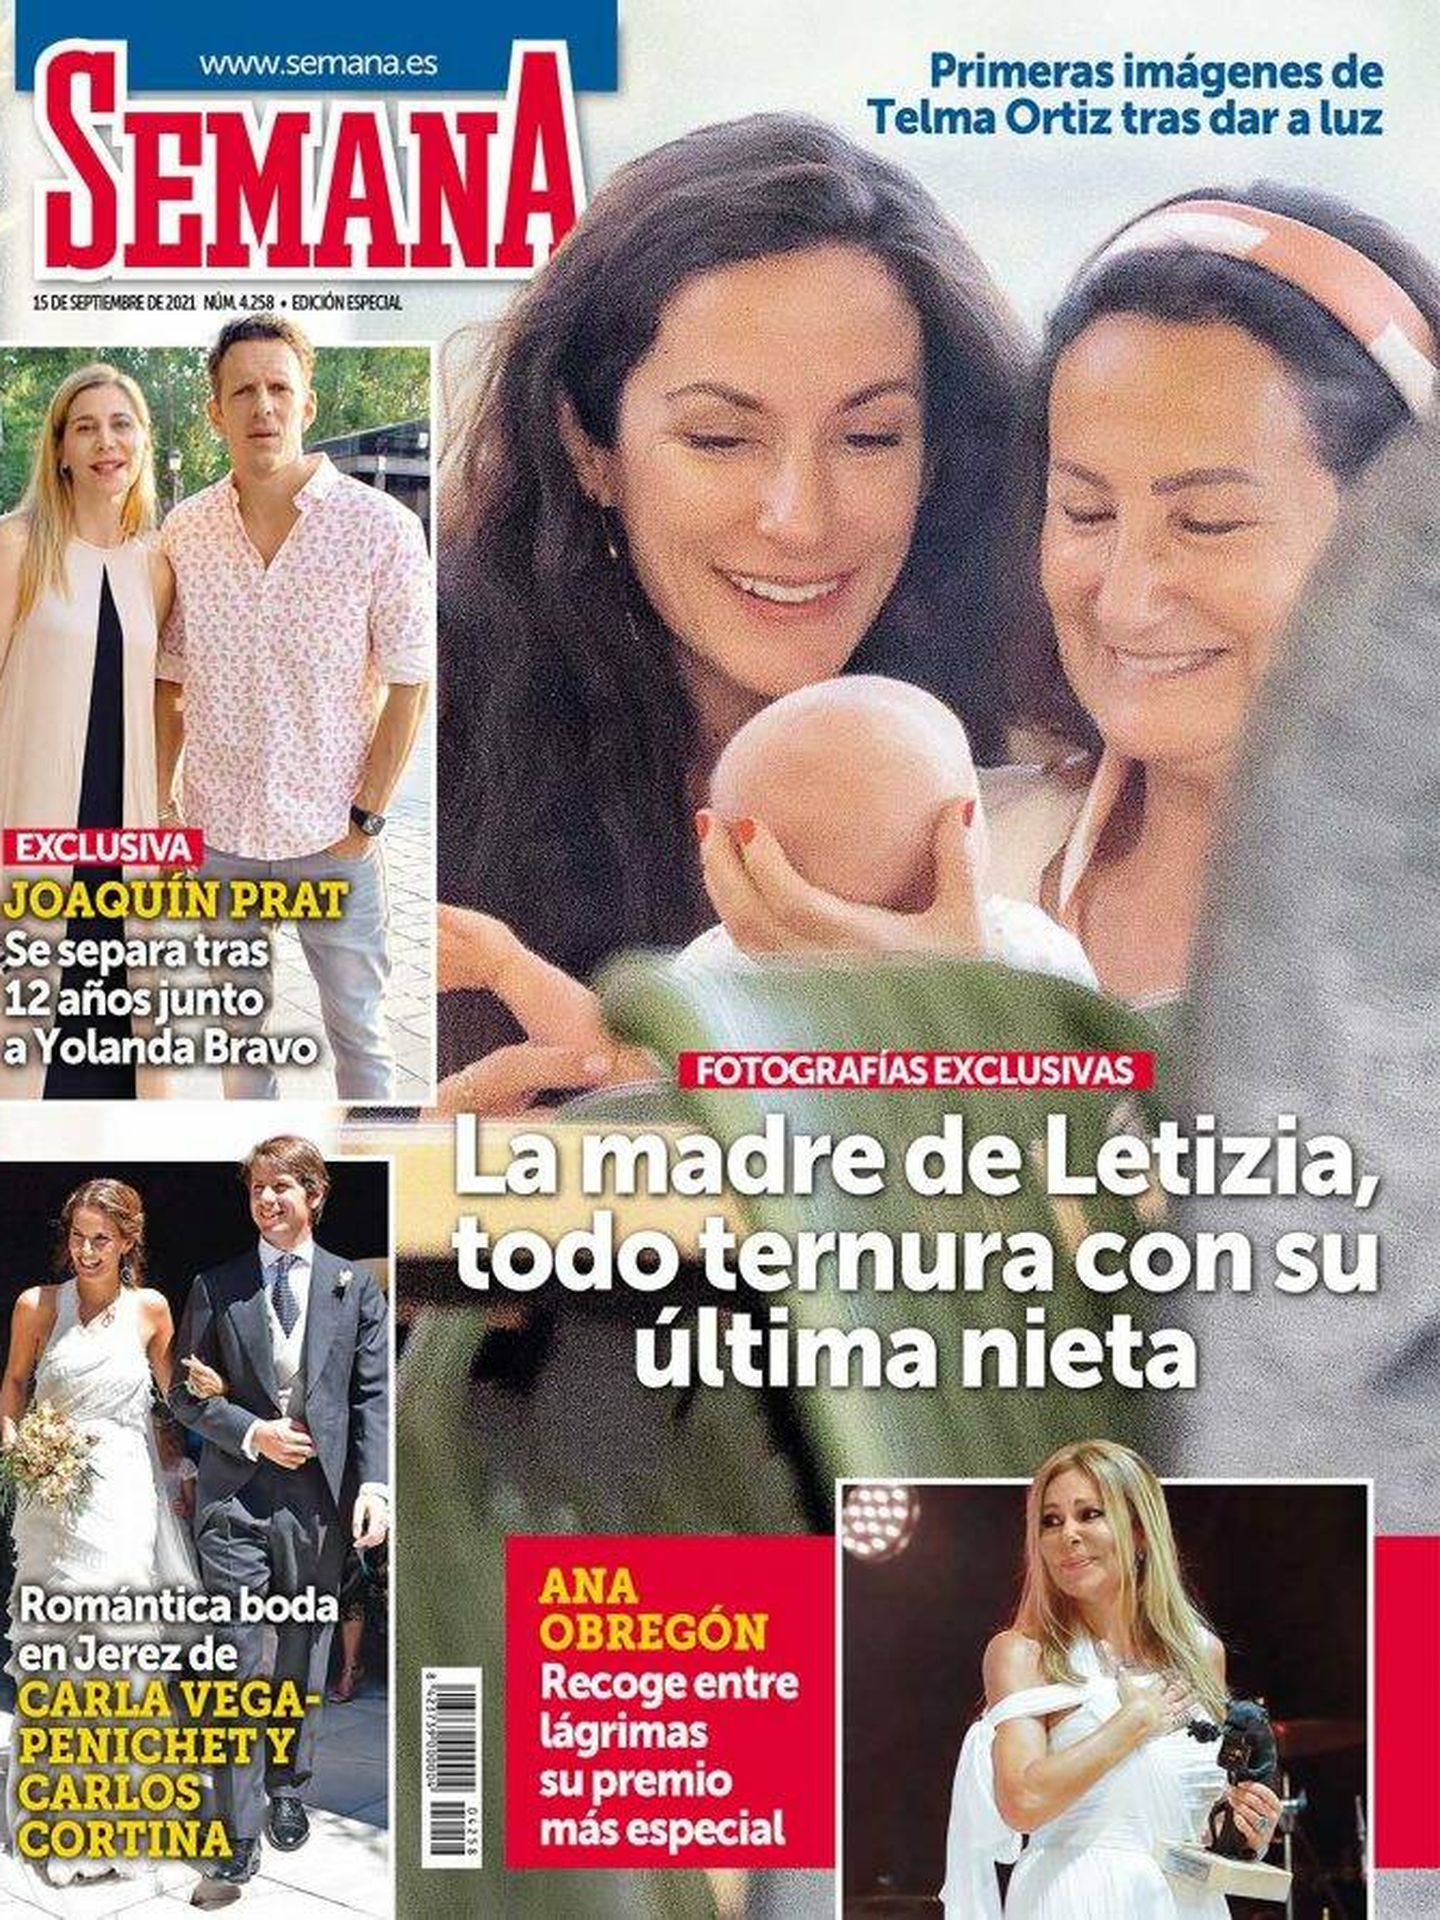 Paloma Rocasolano, con su nueva nieta. (Semana)